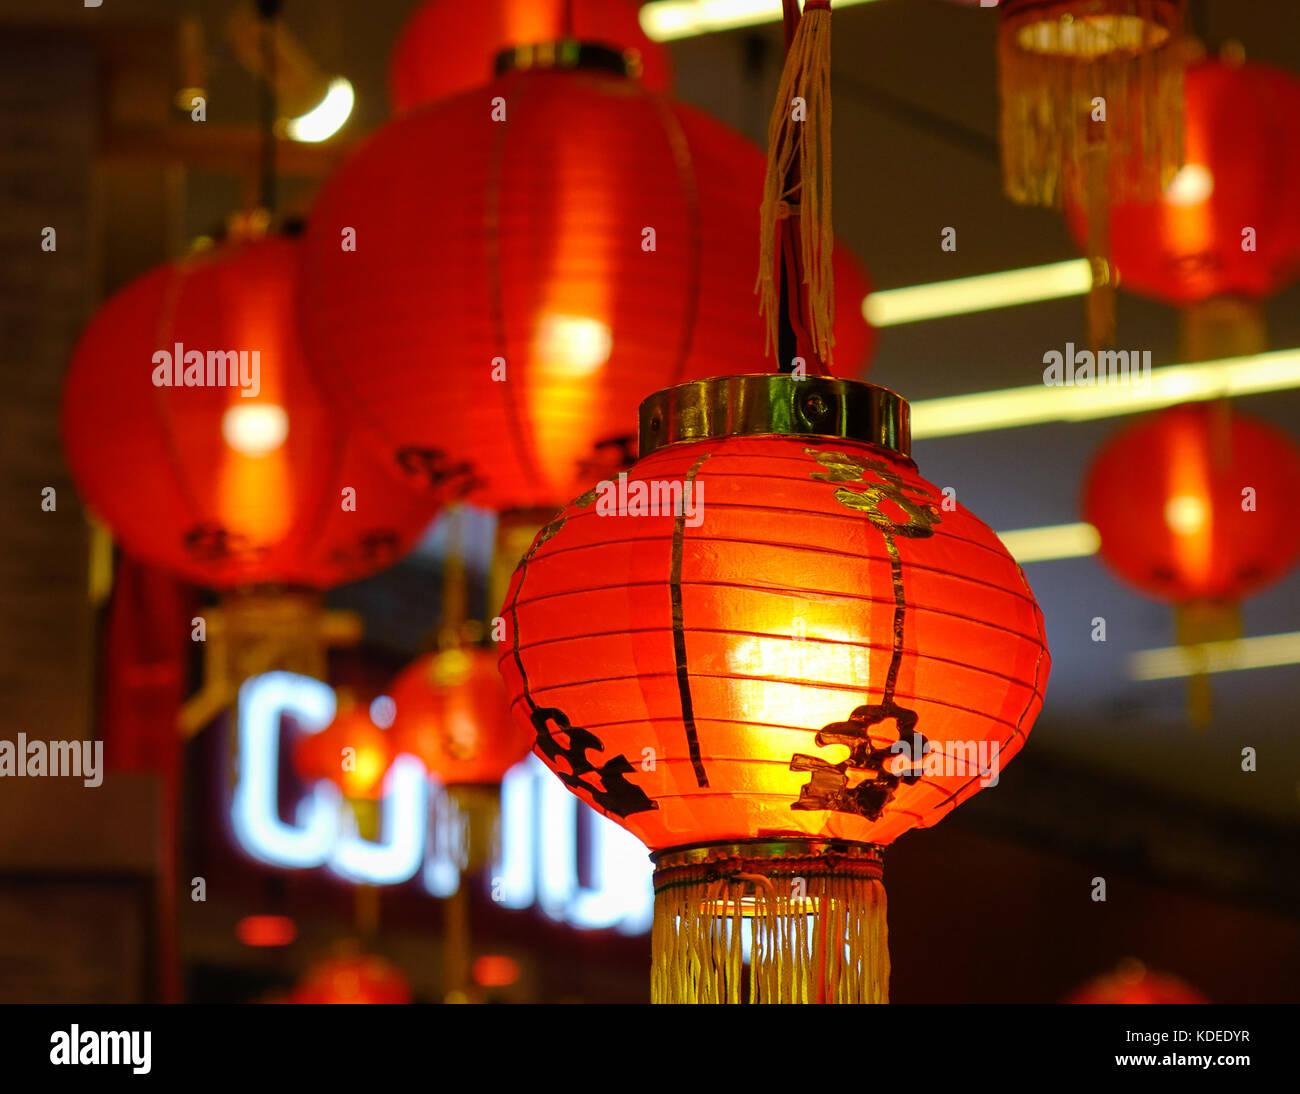 Shopping Kuala Lumpur Malaysia: Shopping Mall Malaysia Lantern Stock Photos & Shopping